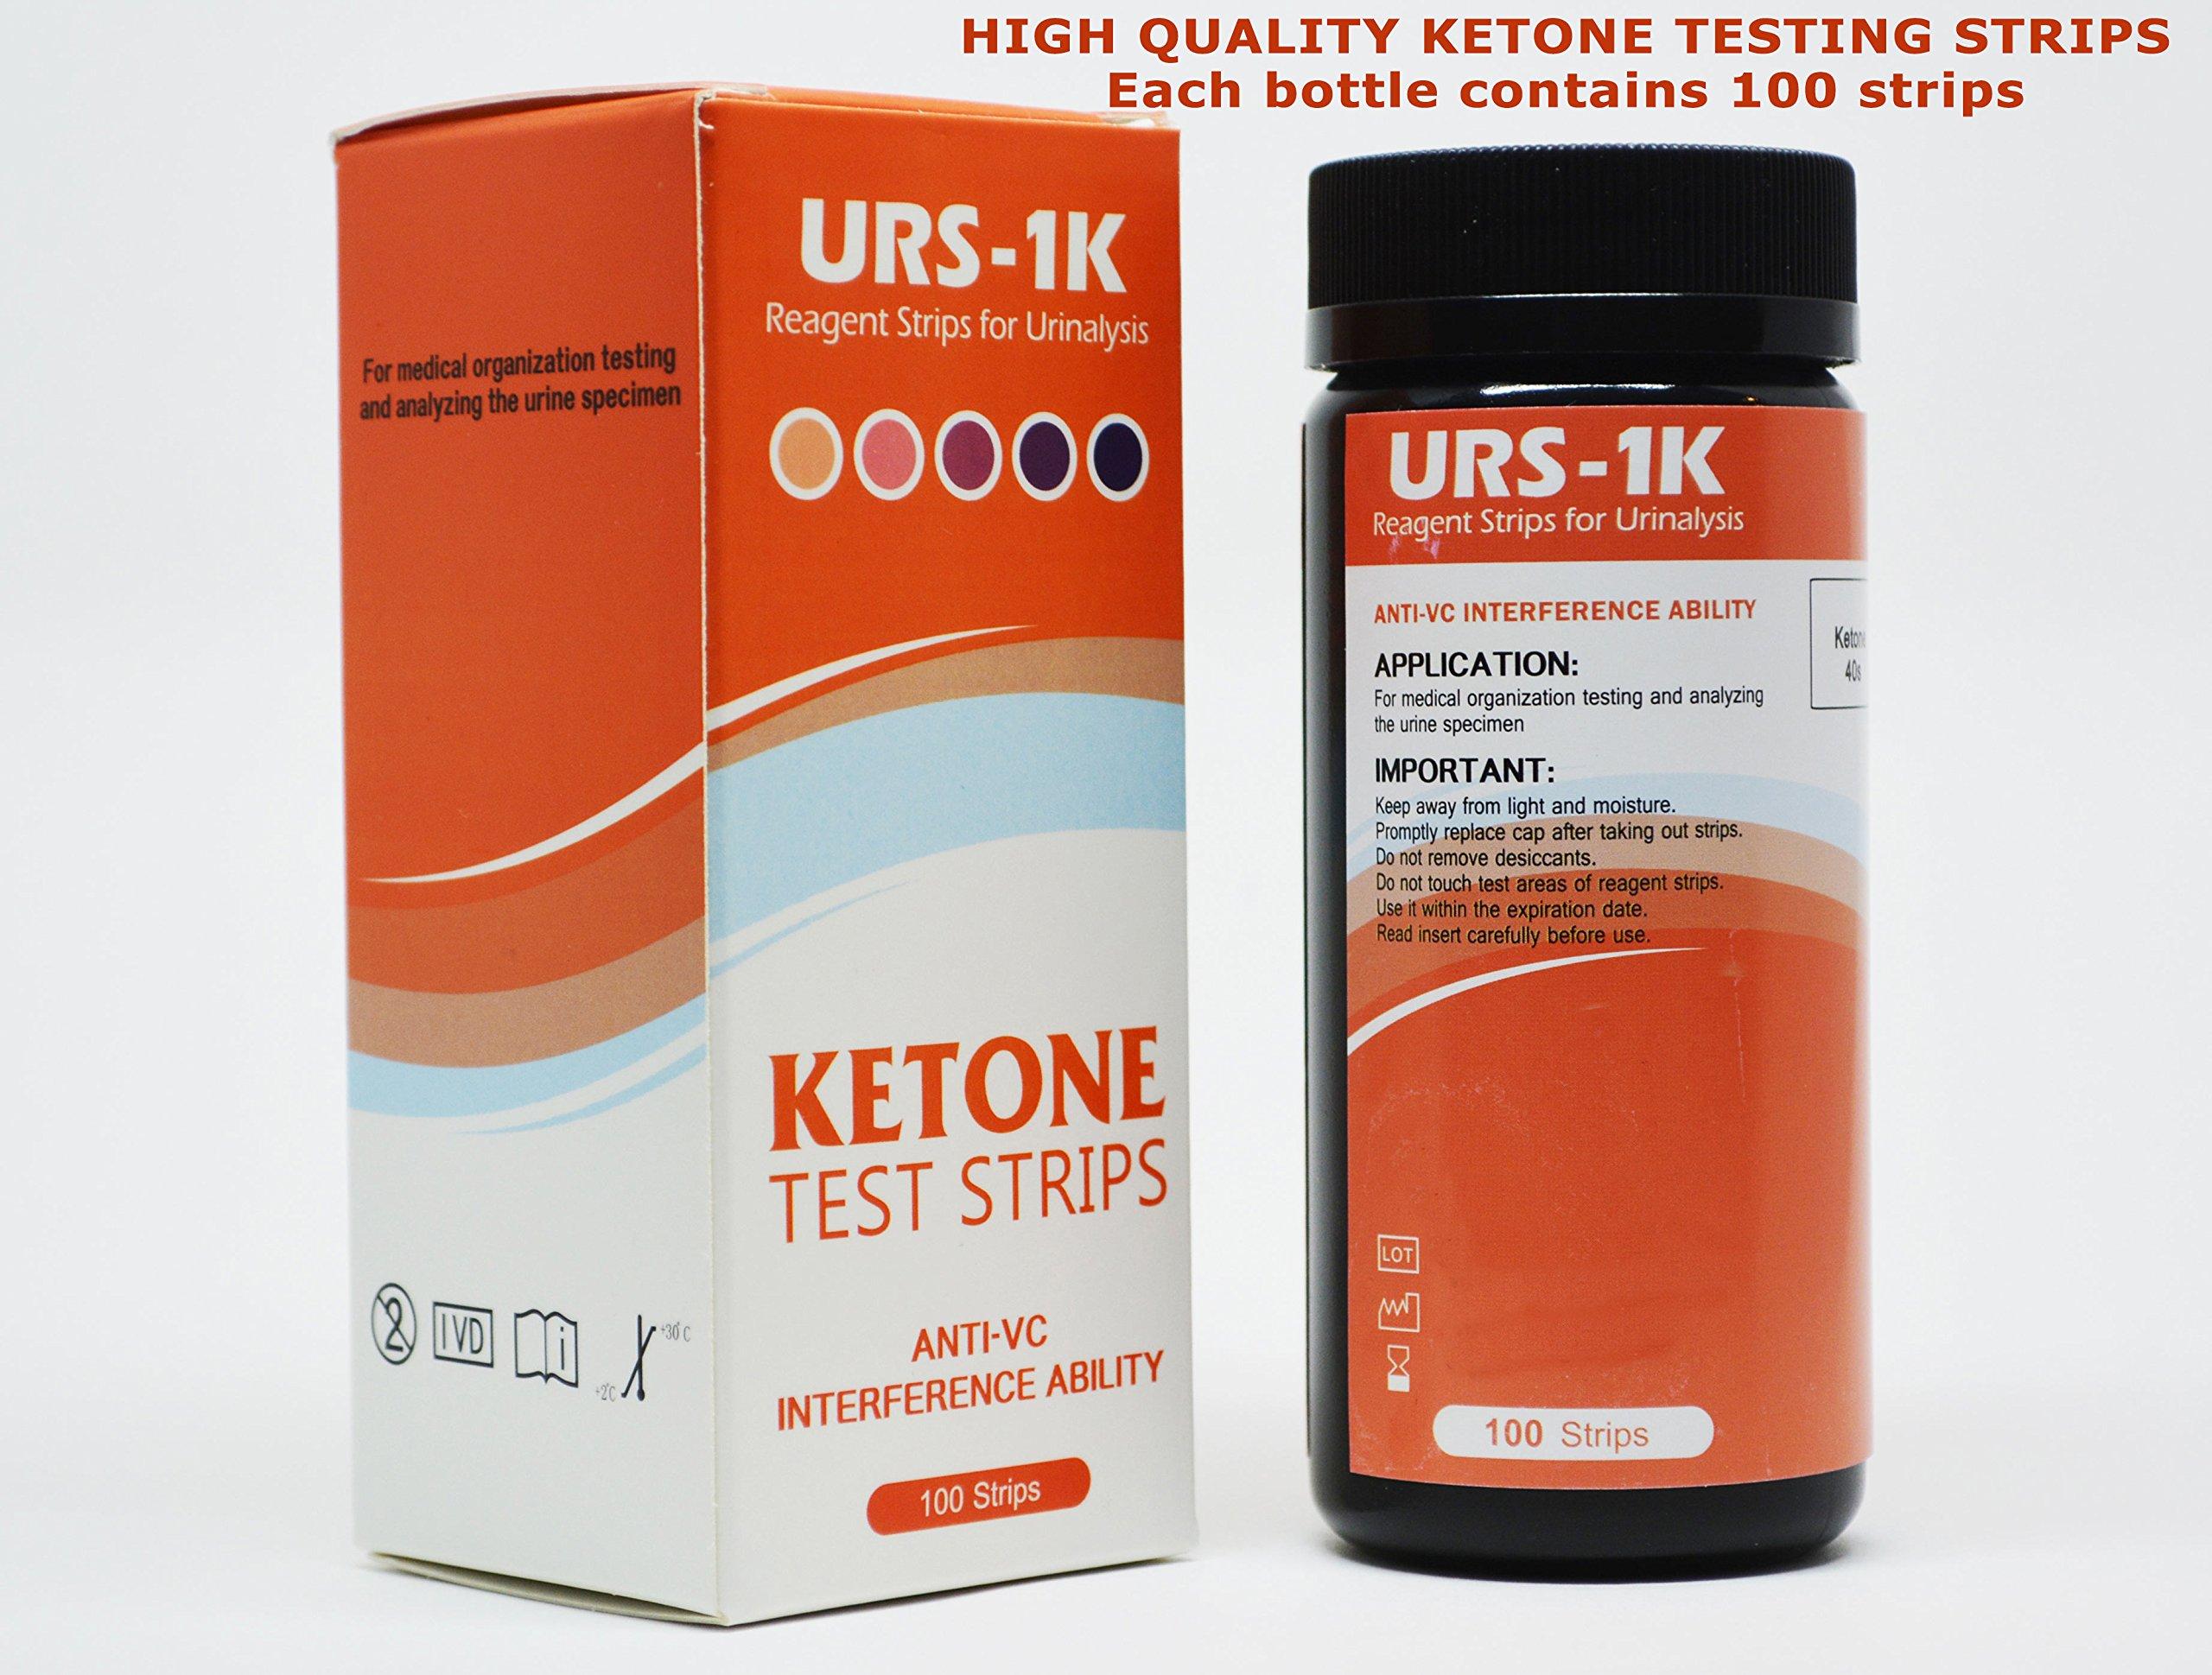 300 Pack (3 Bottles) of Ketone Test Strips - Professional Grade - Ketogenic, Paleo, Atkins Diets by URS-KETONE